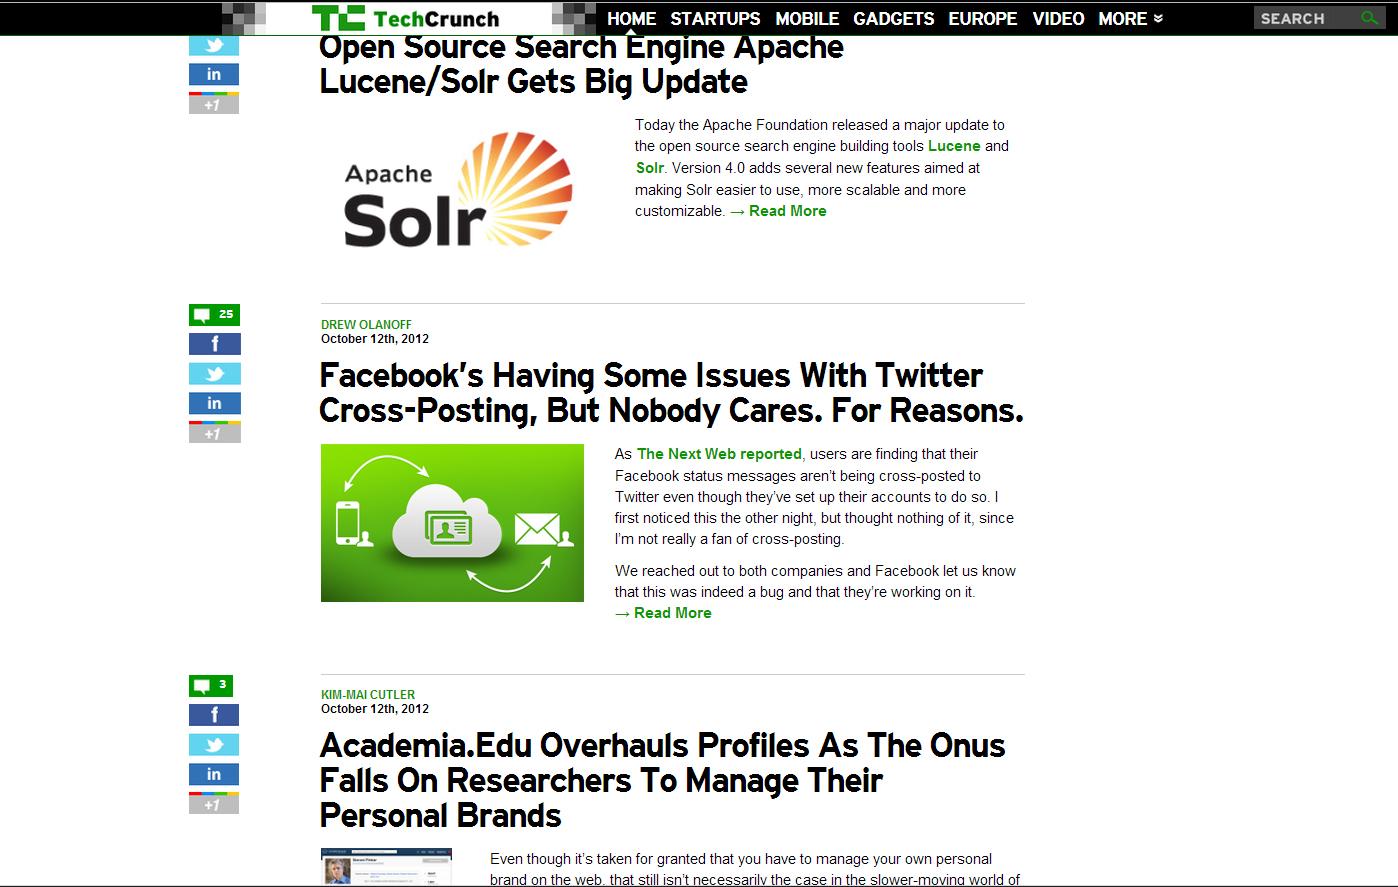 https://techcrunch com/2012/10/15/circas-new-ios-app-will-change-the